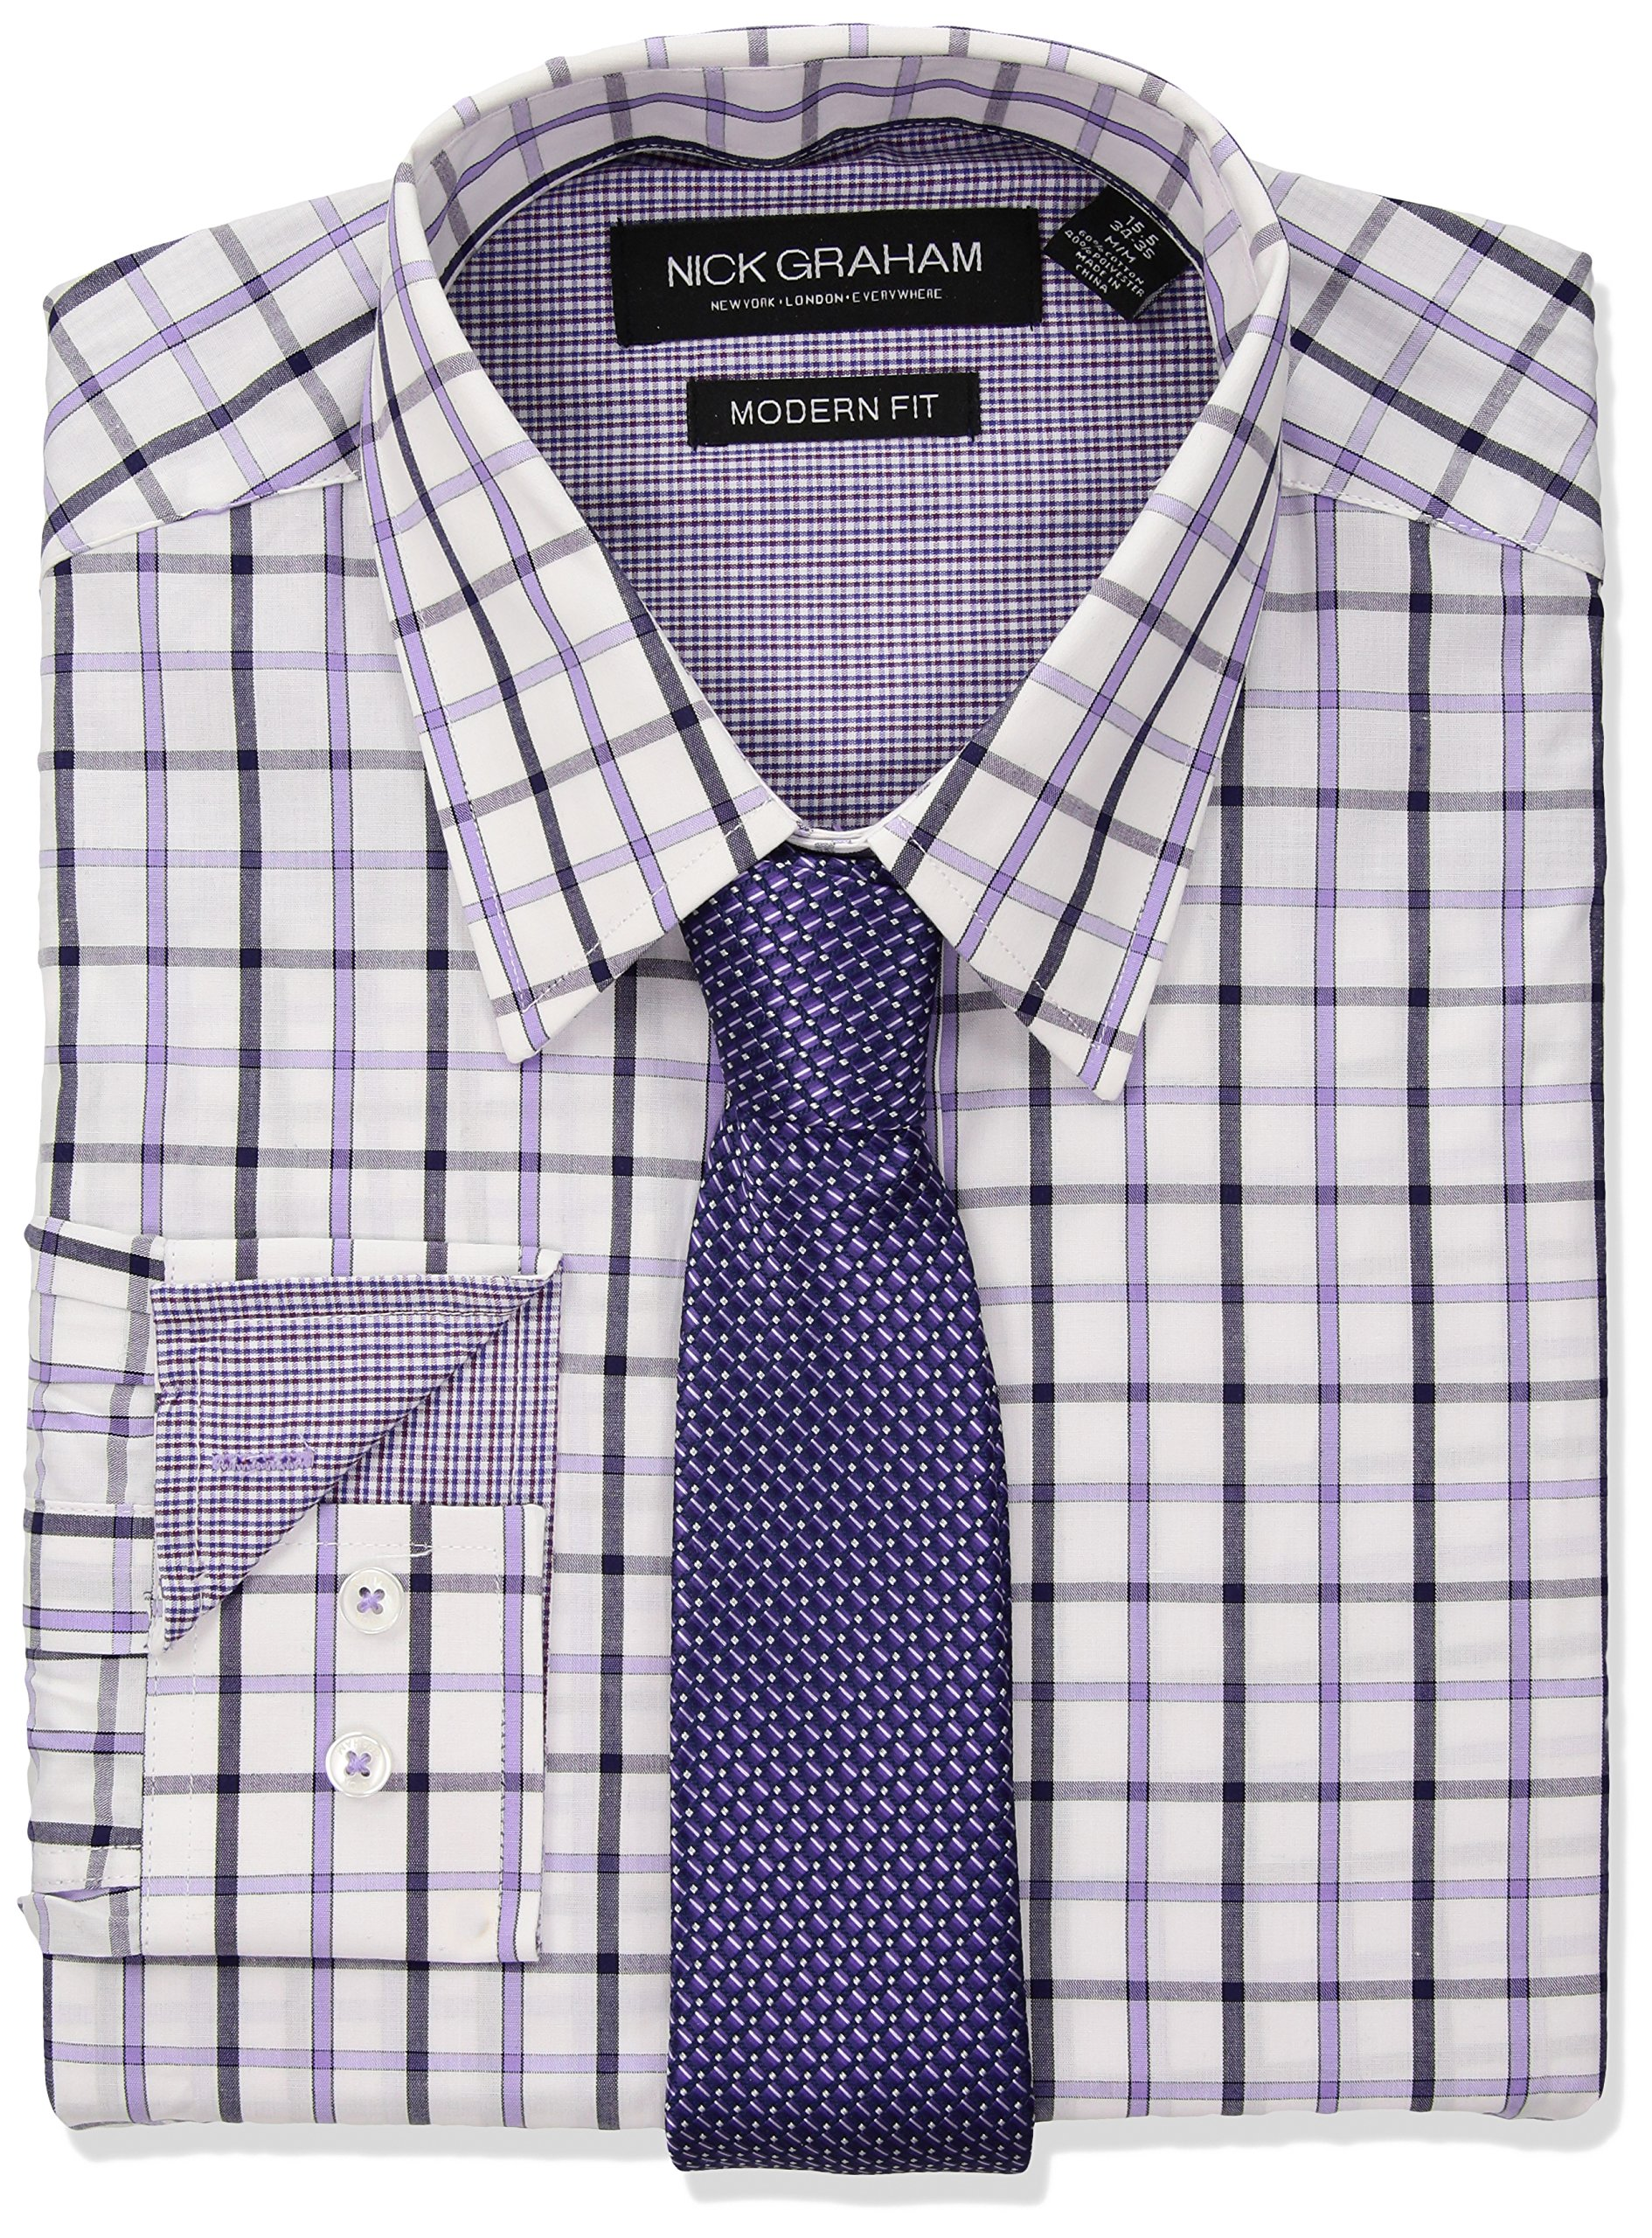 Nick Graham Men's Windowpane Dress Shirt with Tie Set, Purple, 17''-17.5'' Neck 34''-35'' Sleeve